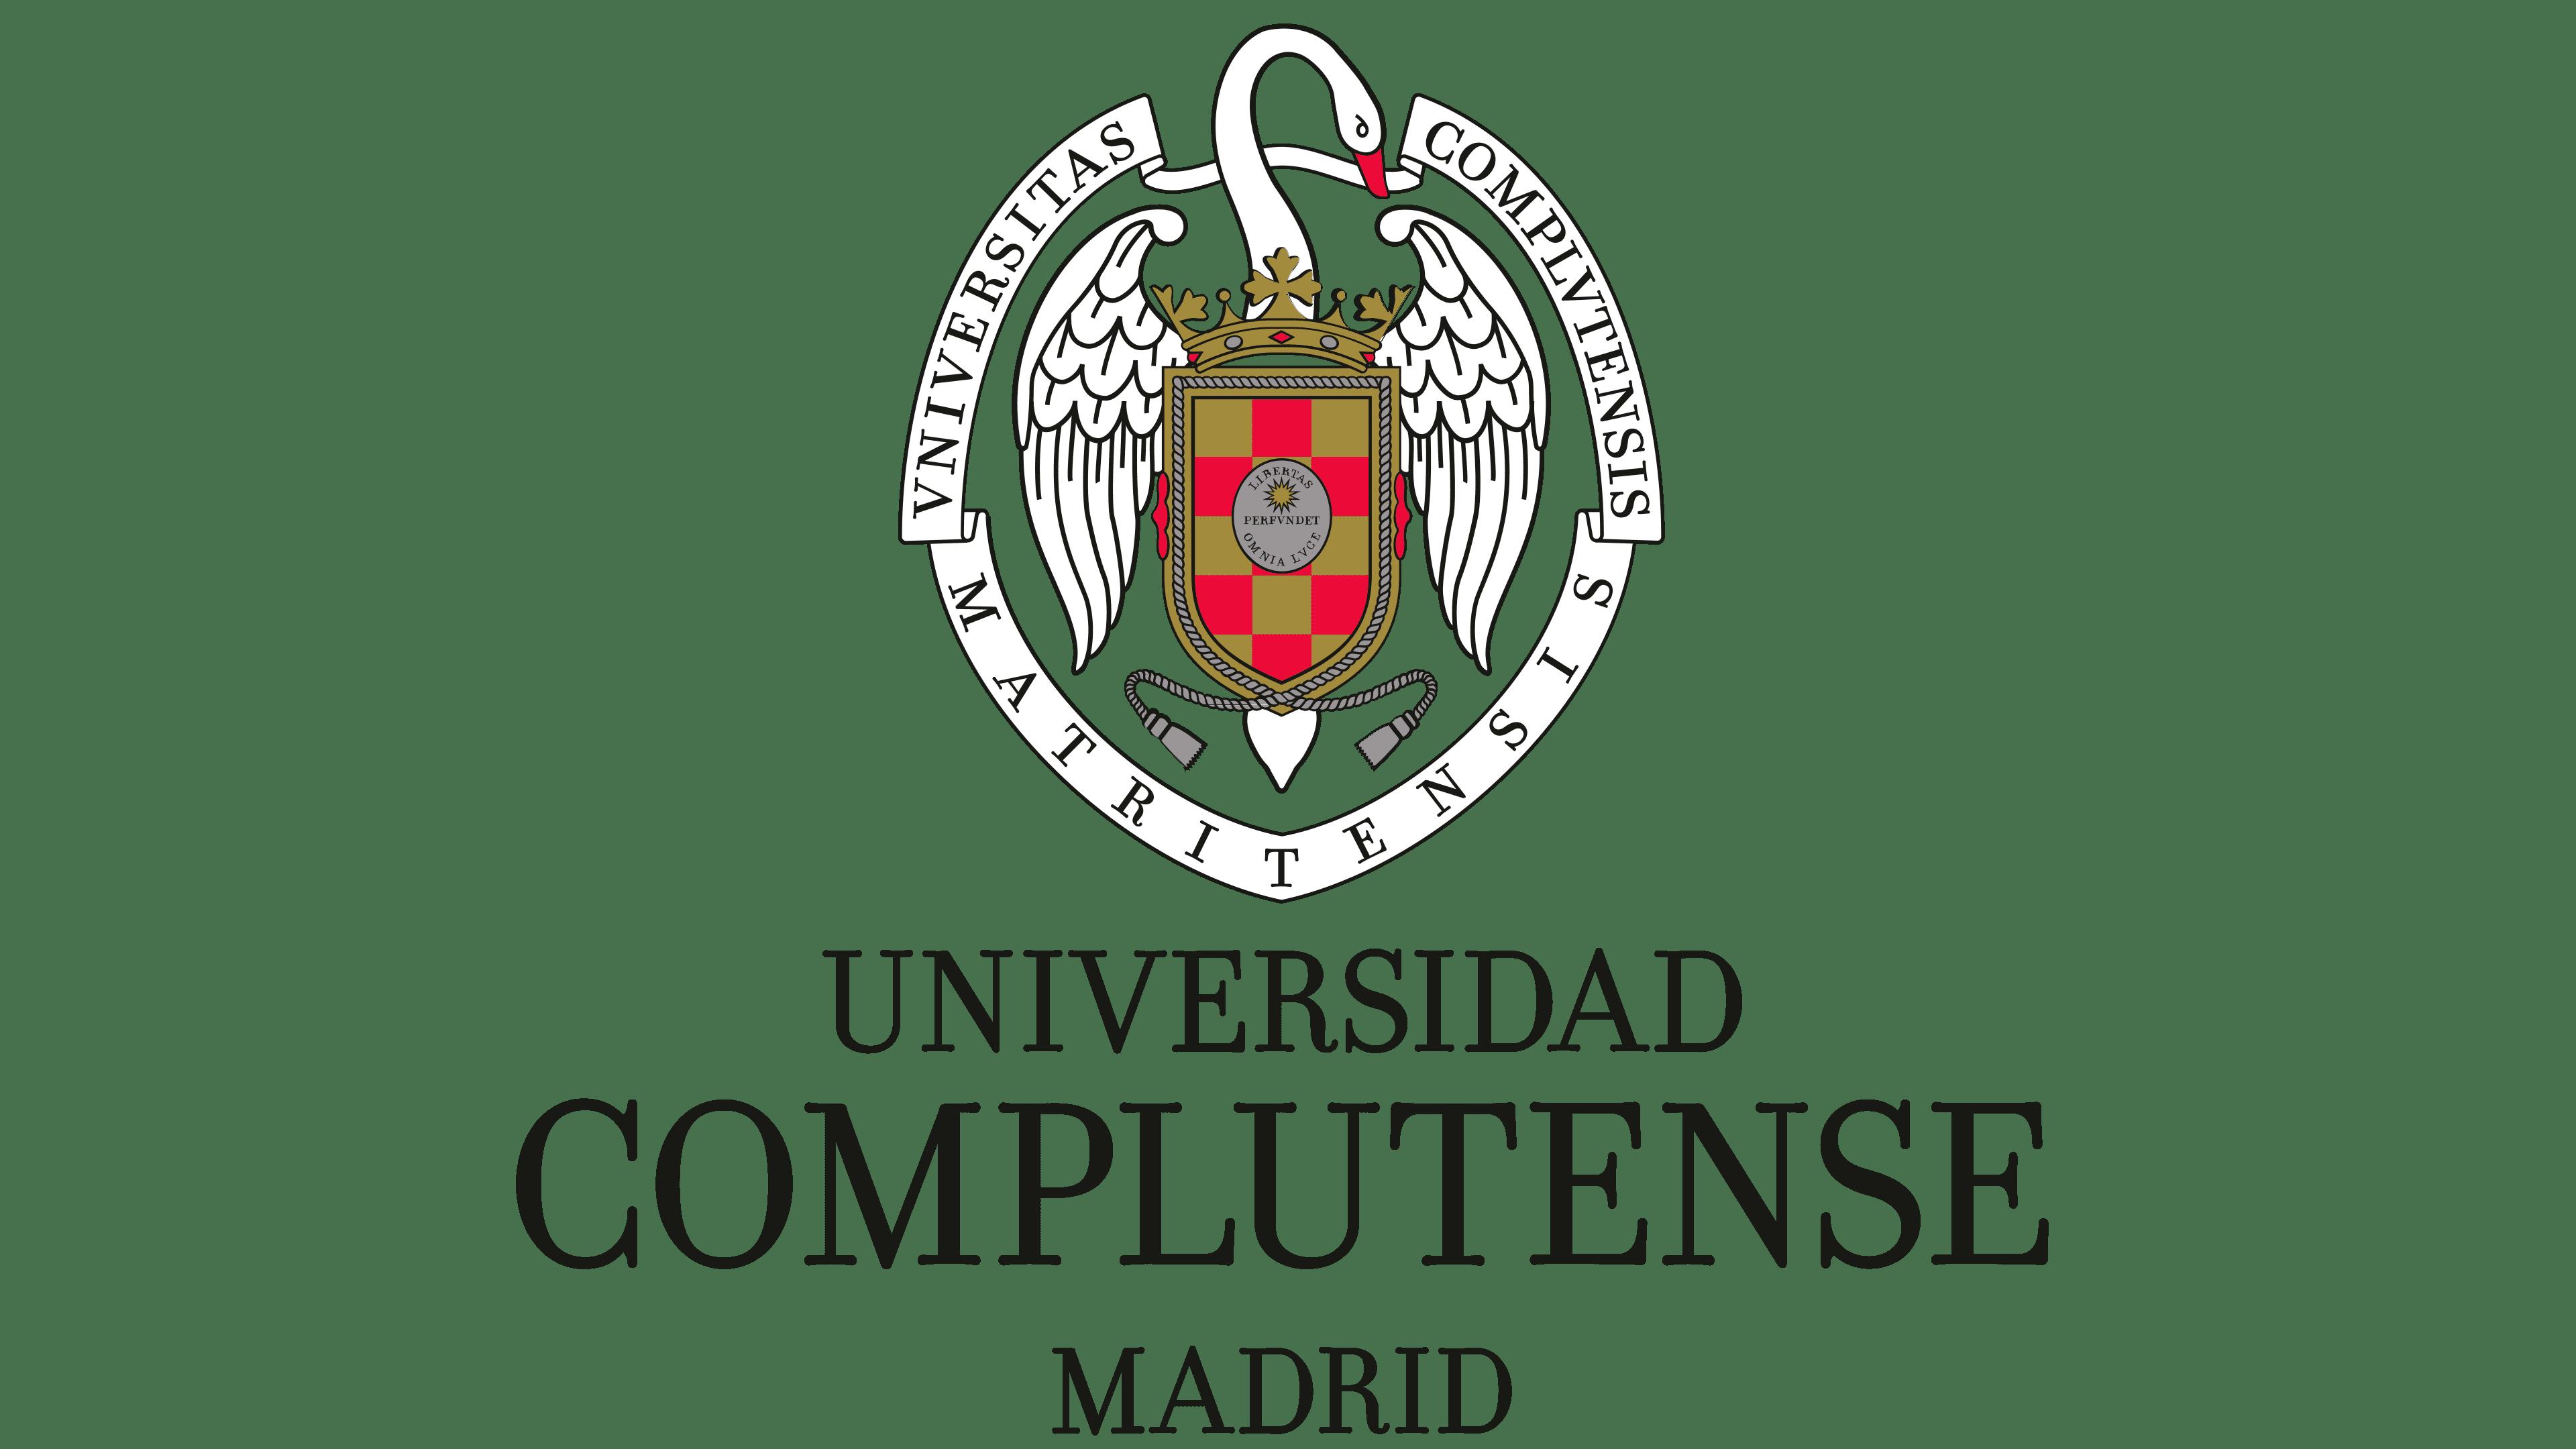 Complutense University of Madrid (UCM)